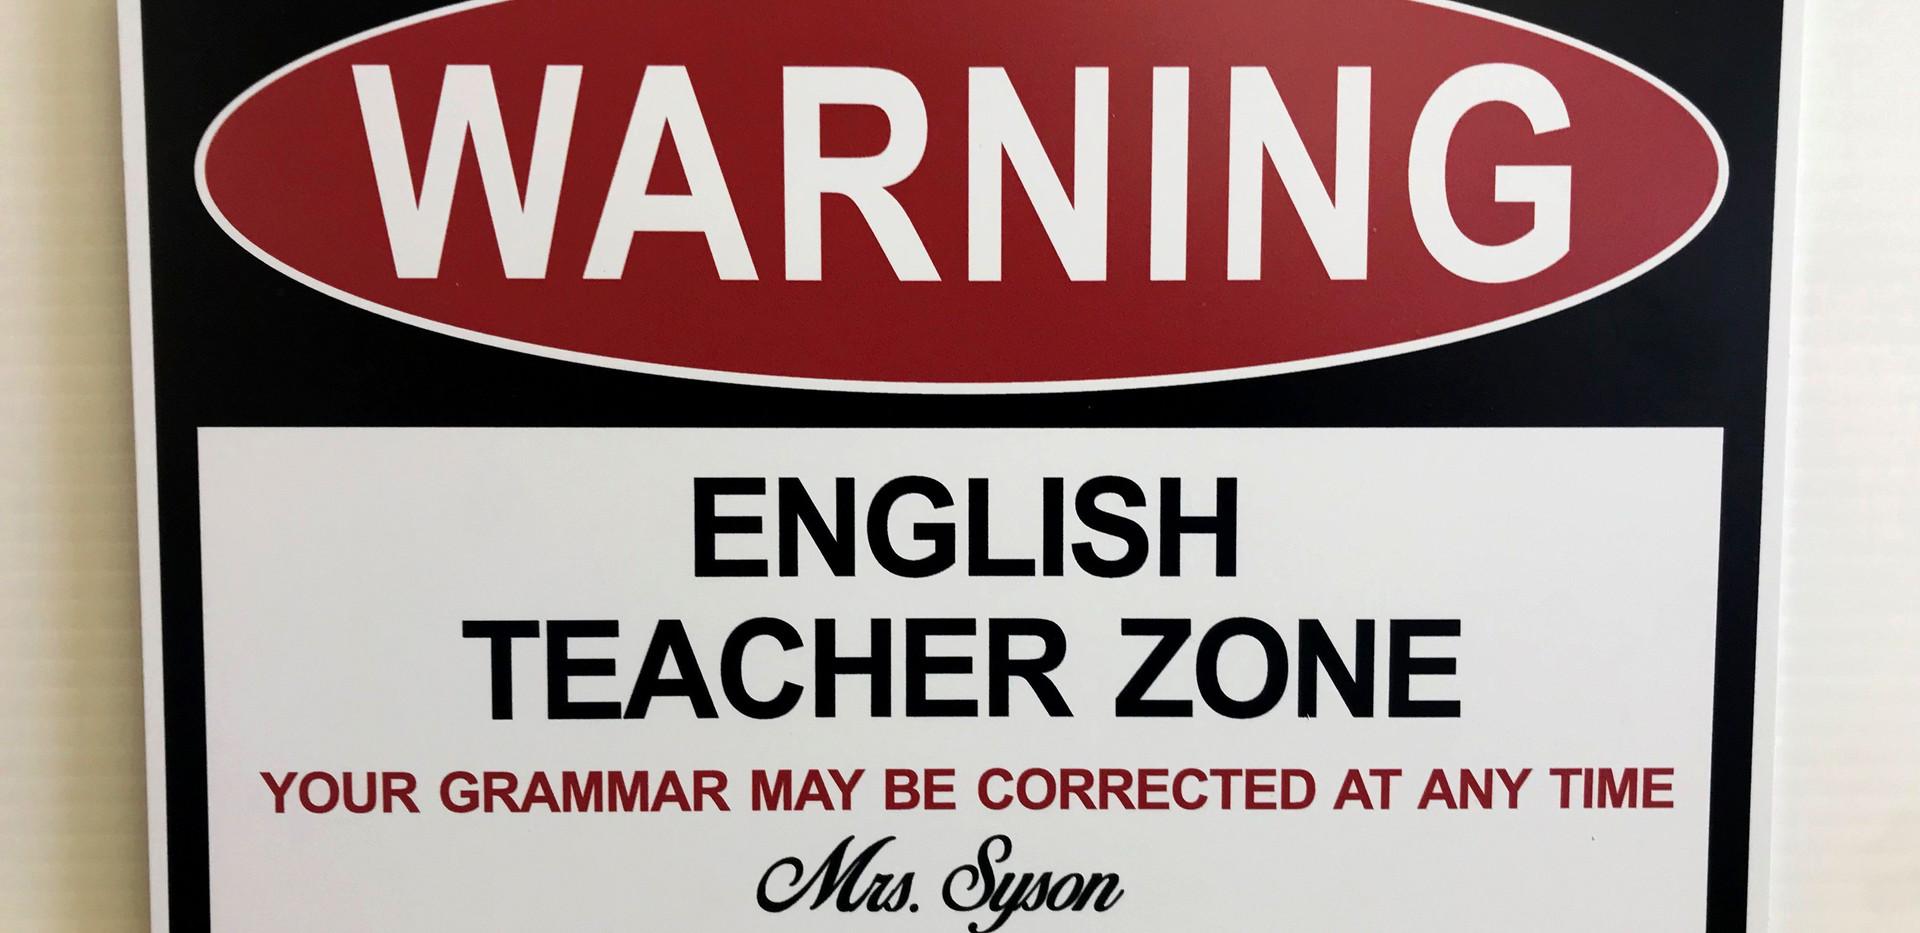 Warning English Teacher Zone.jpg